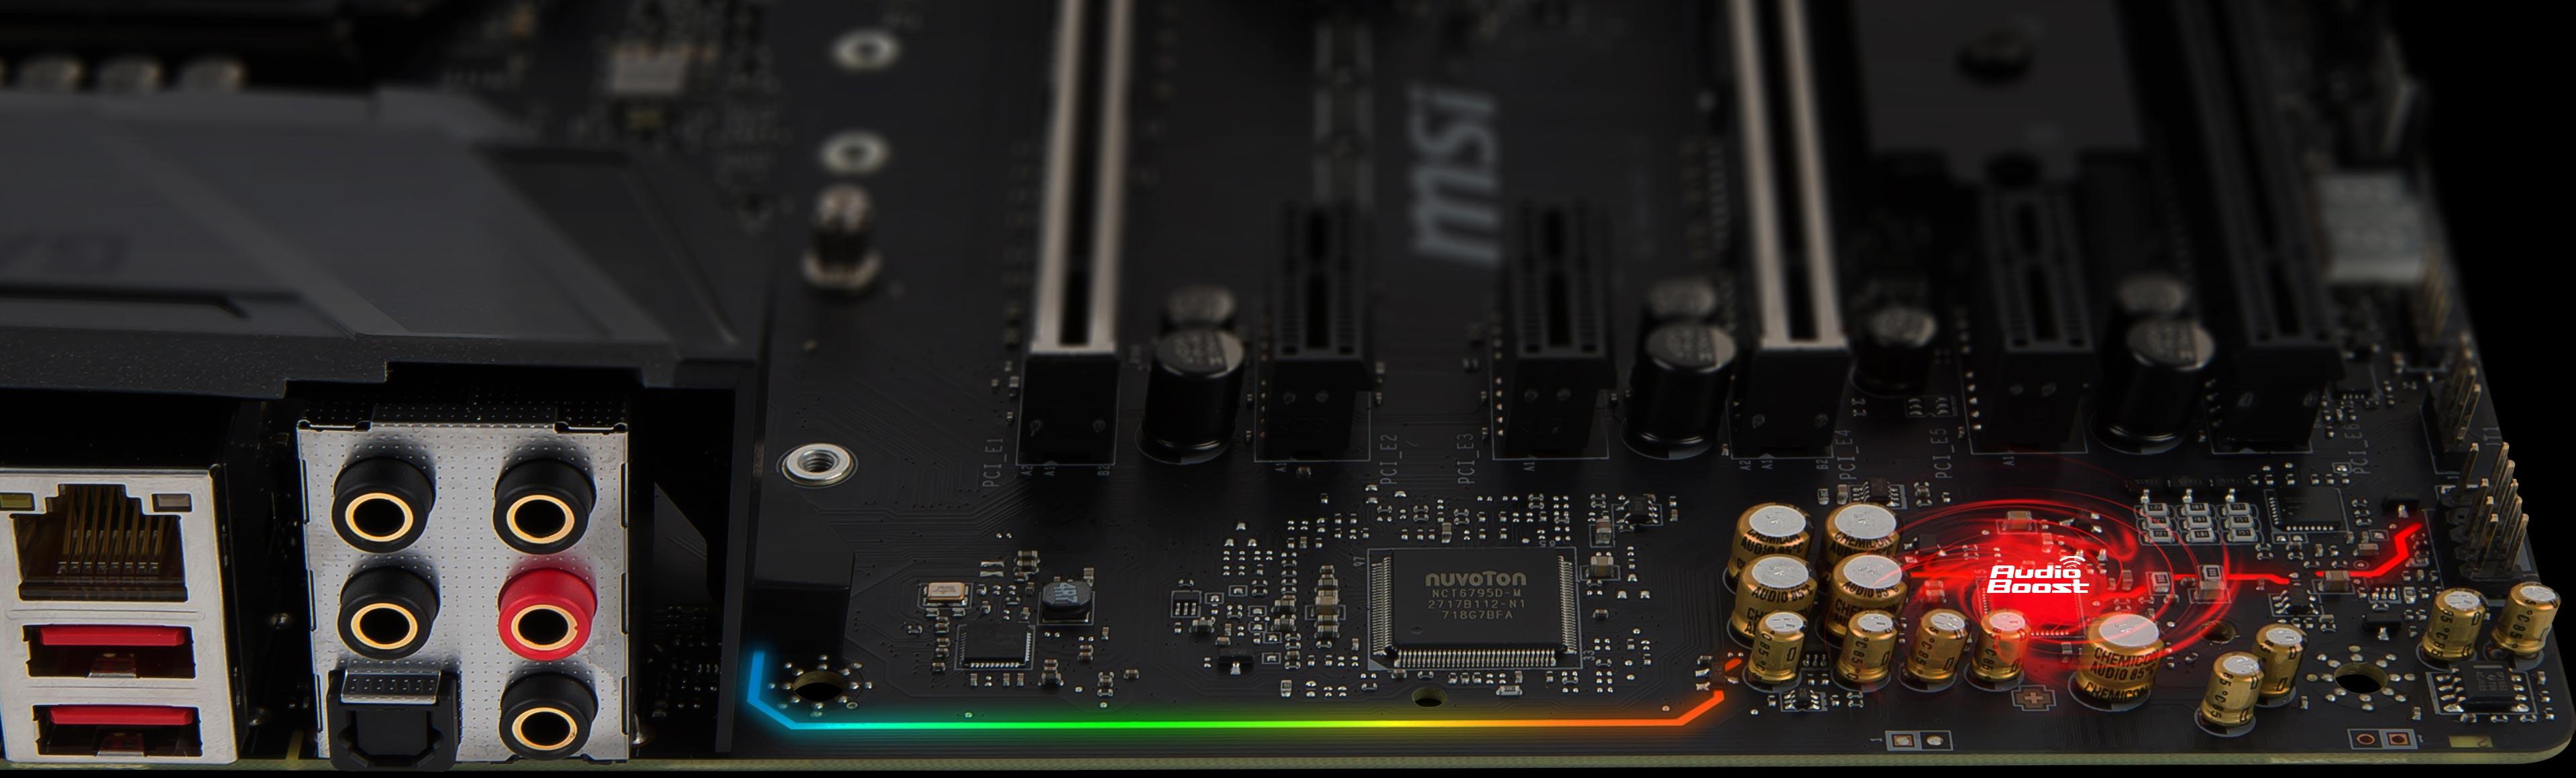 Msi Z370 Gaming M5 M.2 Slot